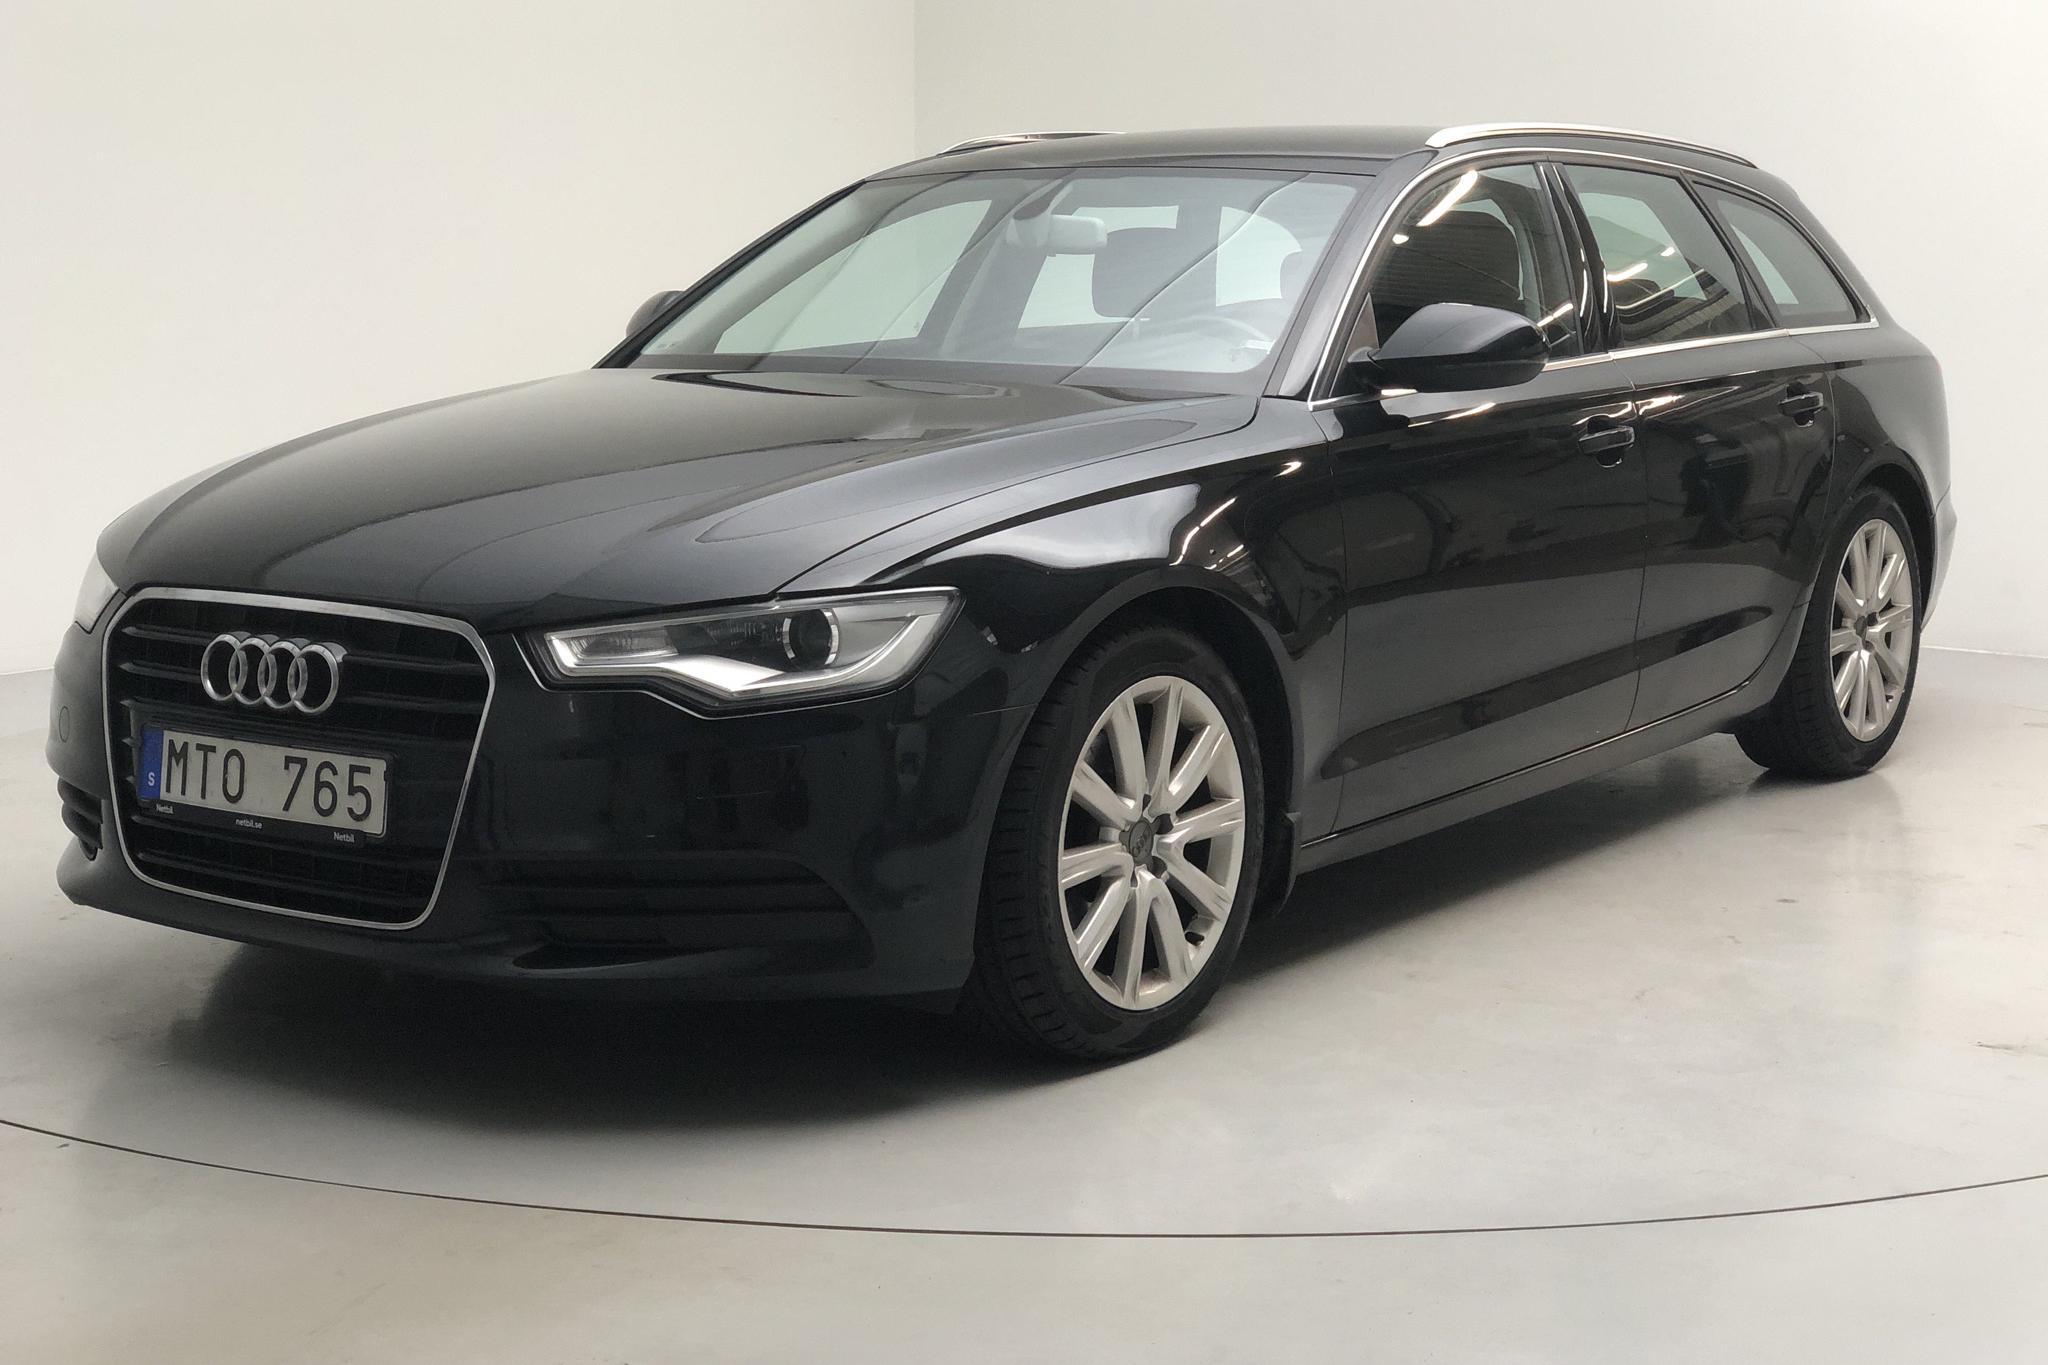 Audi A6 2.0 TDI Avant (177hk) - 17 645 mil - Automat - svart - 2012